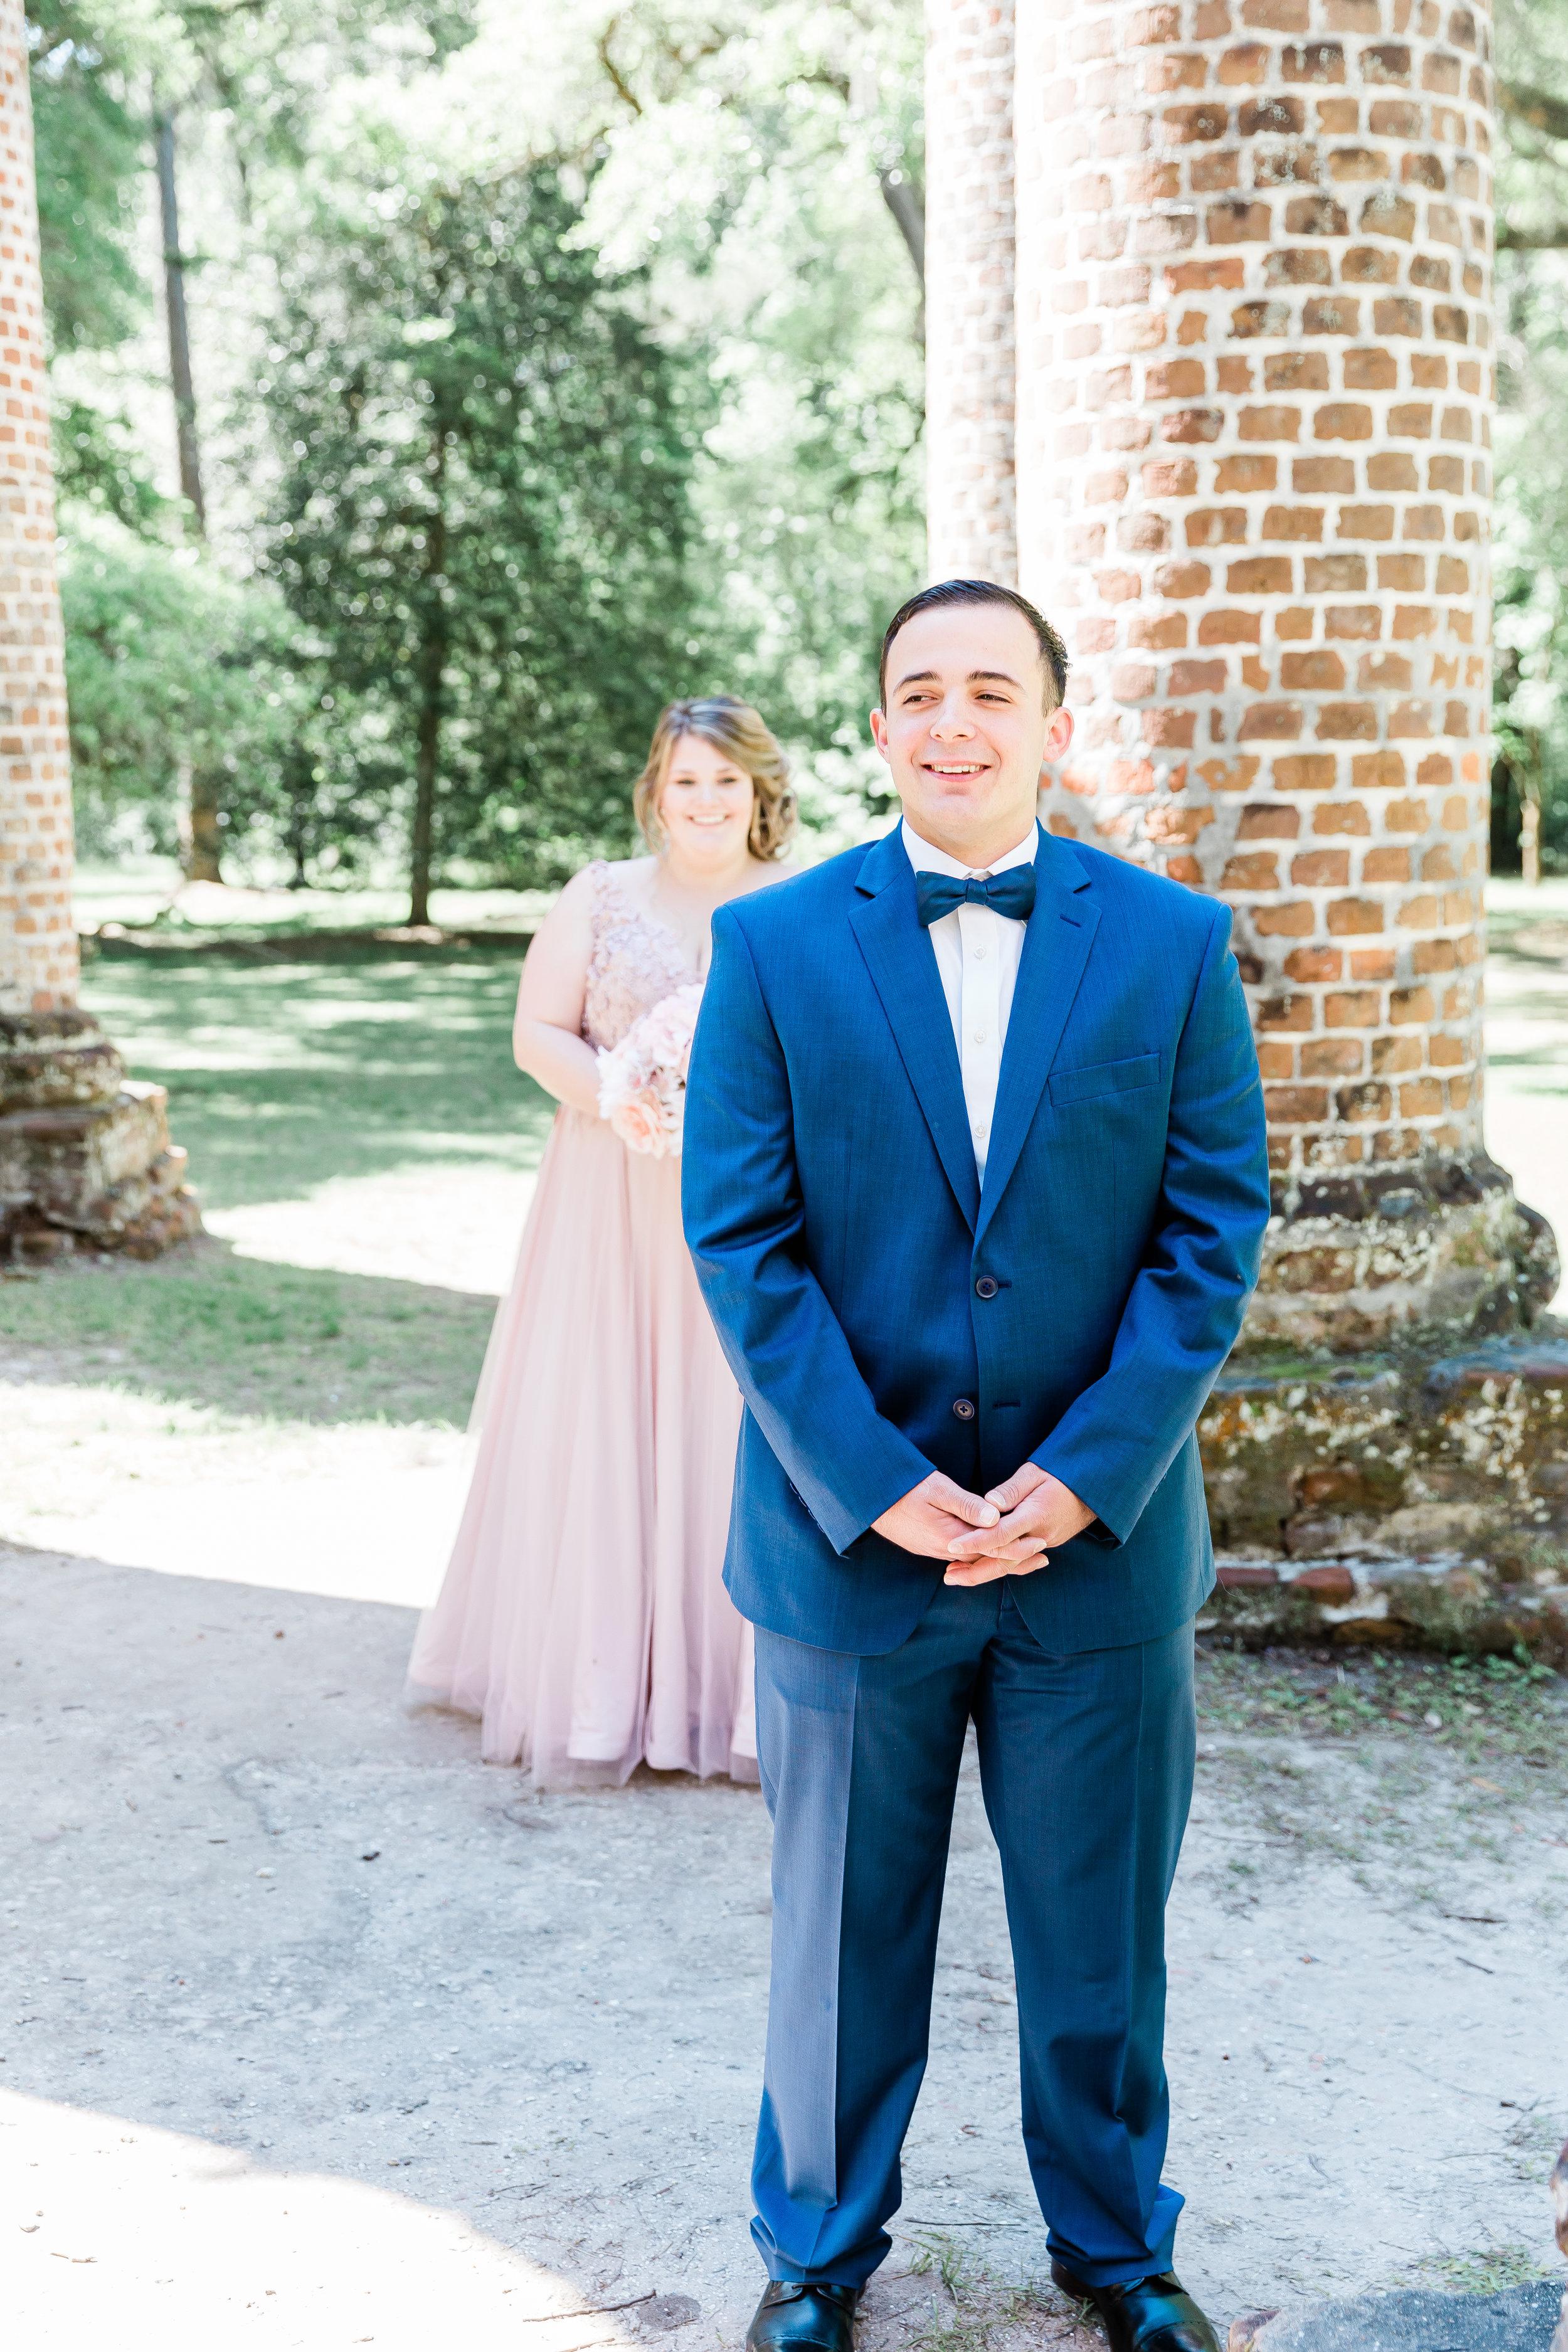 20190417-Southern Lens Photography-savannah family photographer- Ashley and Zack-old sheldon church ruins-201918.jpg